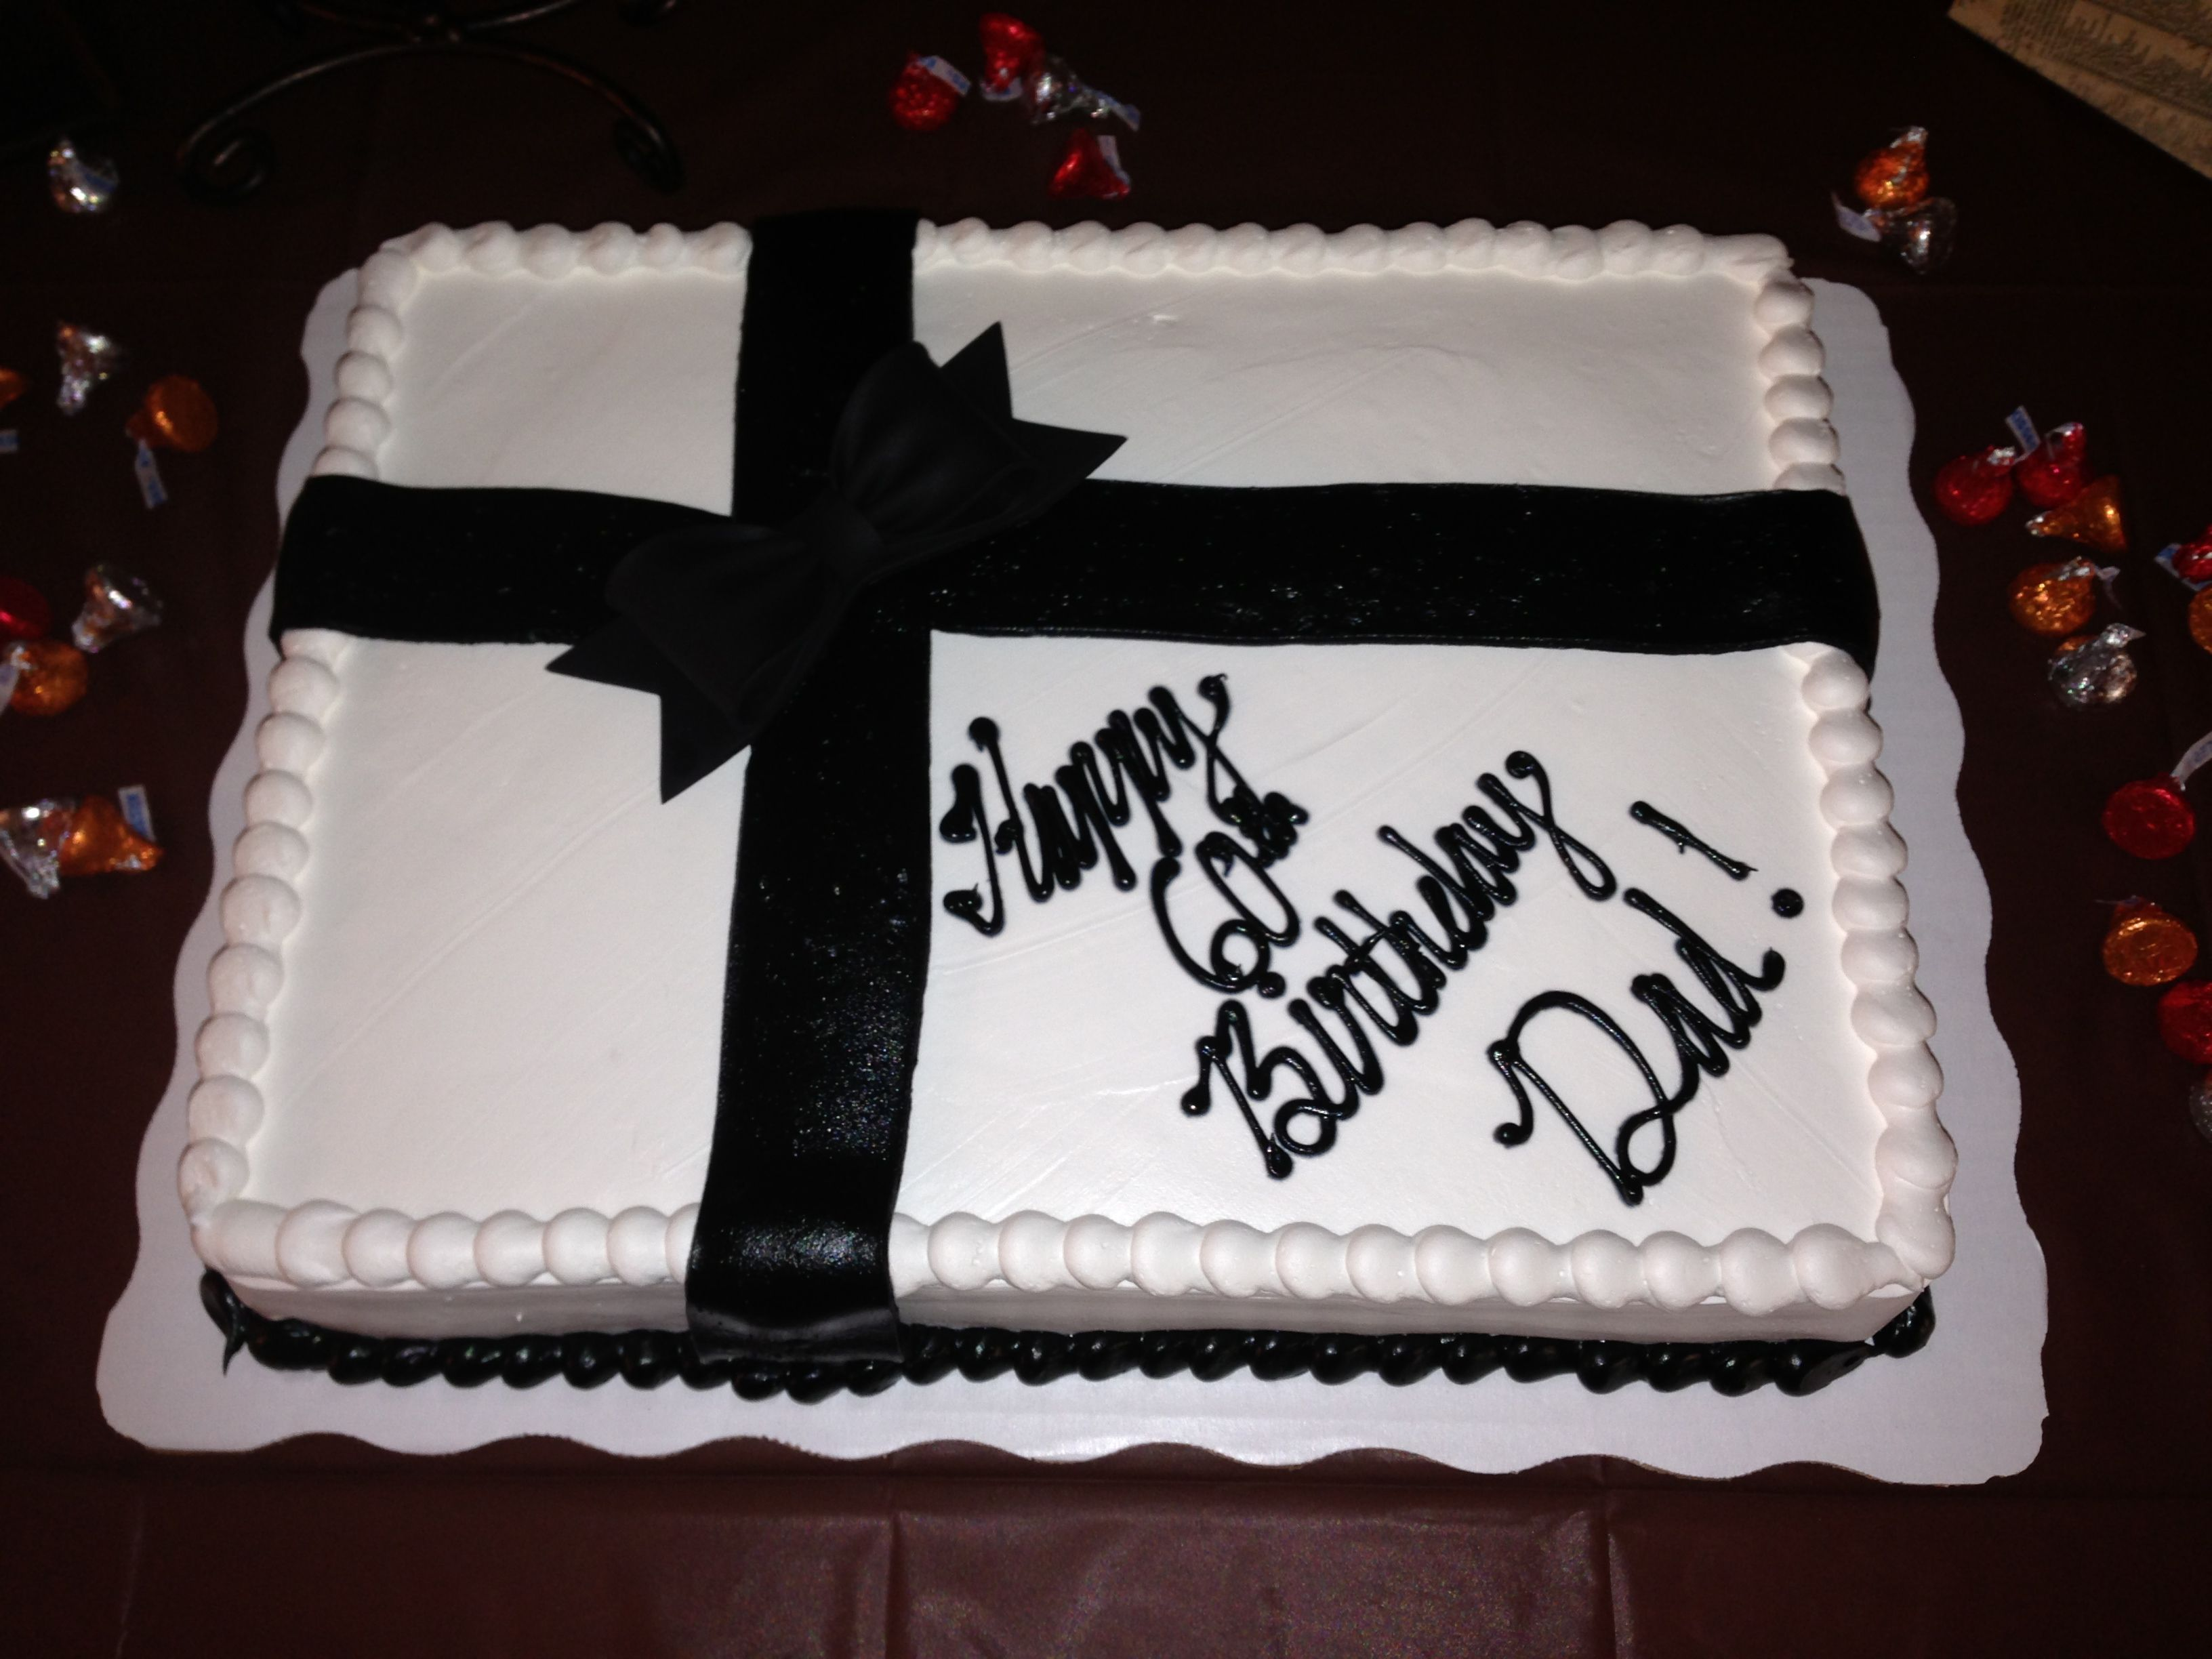 Sams Club Cake Sams Club Cake 60th Birthday Party Cake